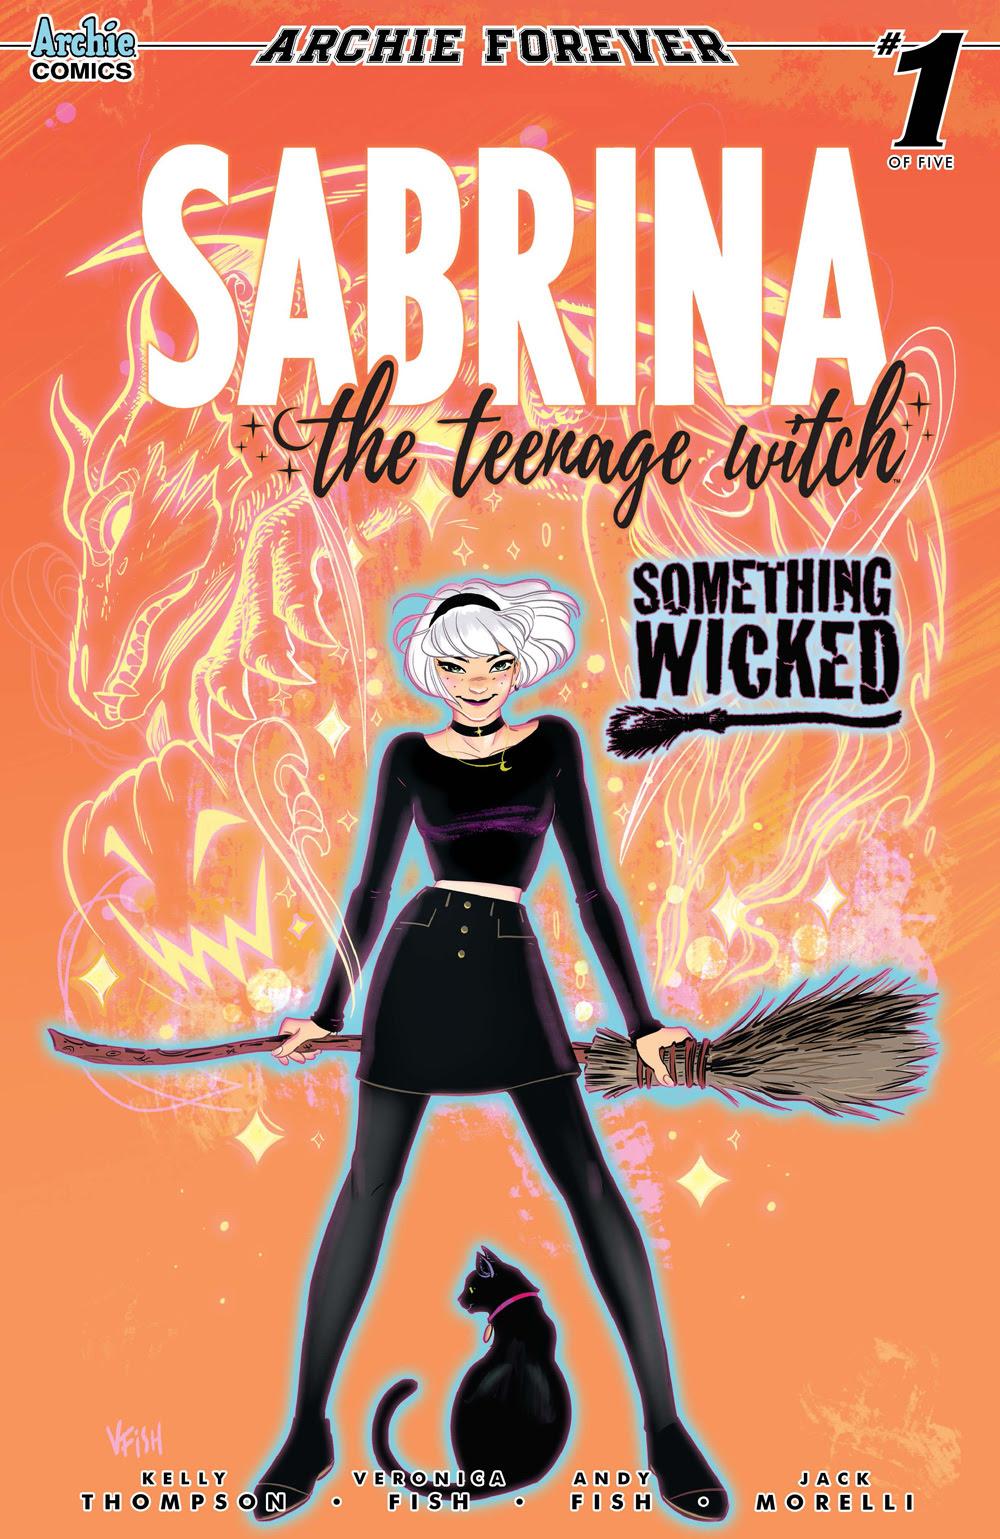 SABRINA: SOMETHING WICKED #1: CVR A Fish